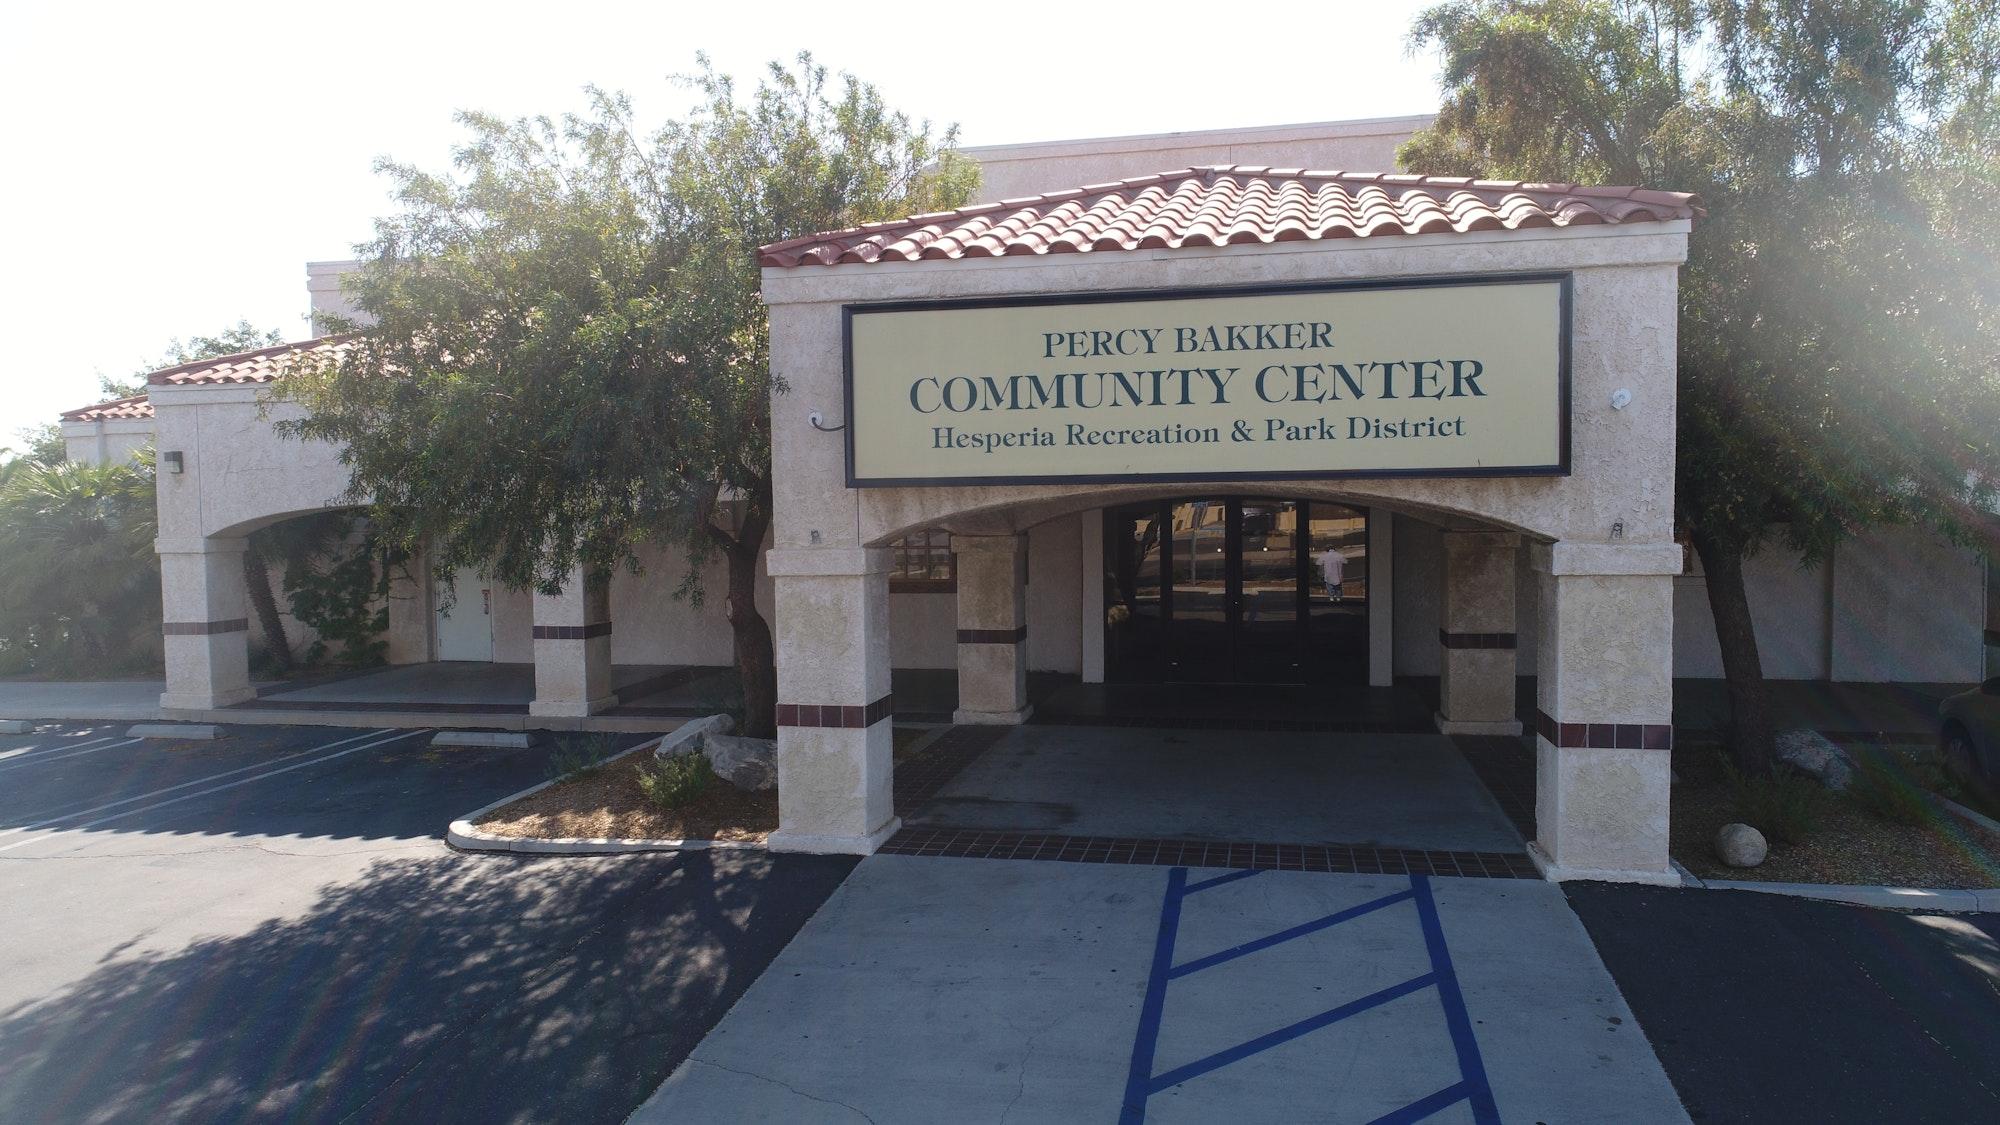 Percy Bakker Community Center front enterance